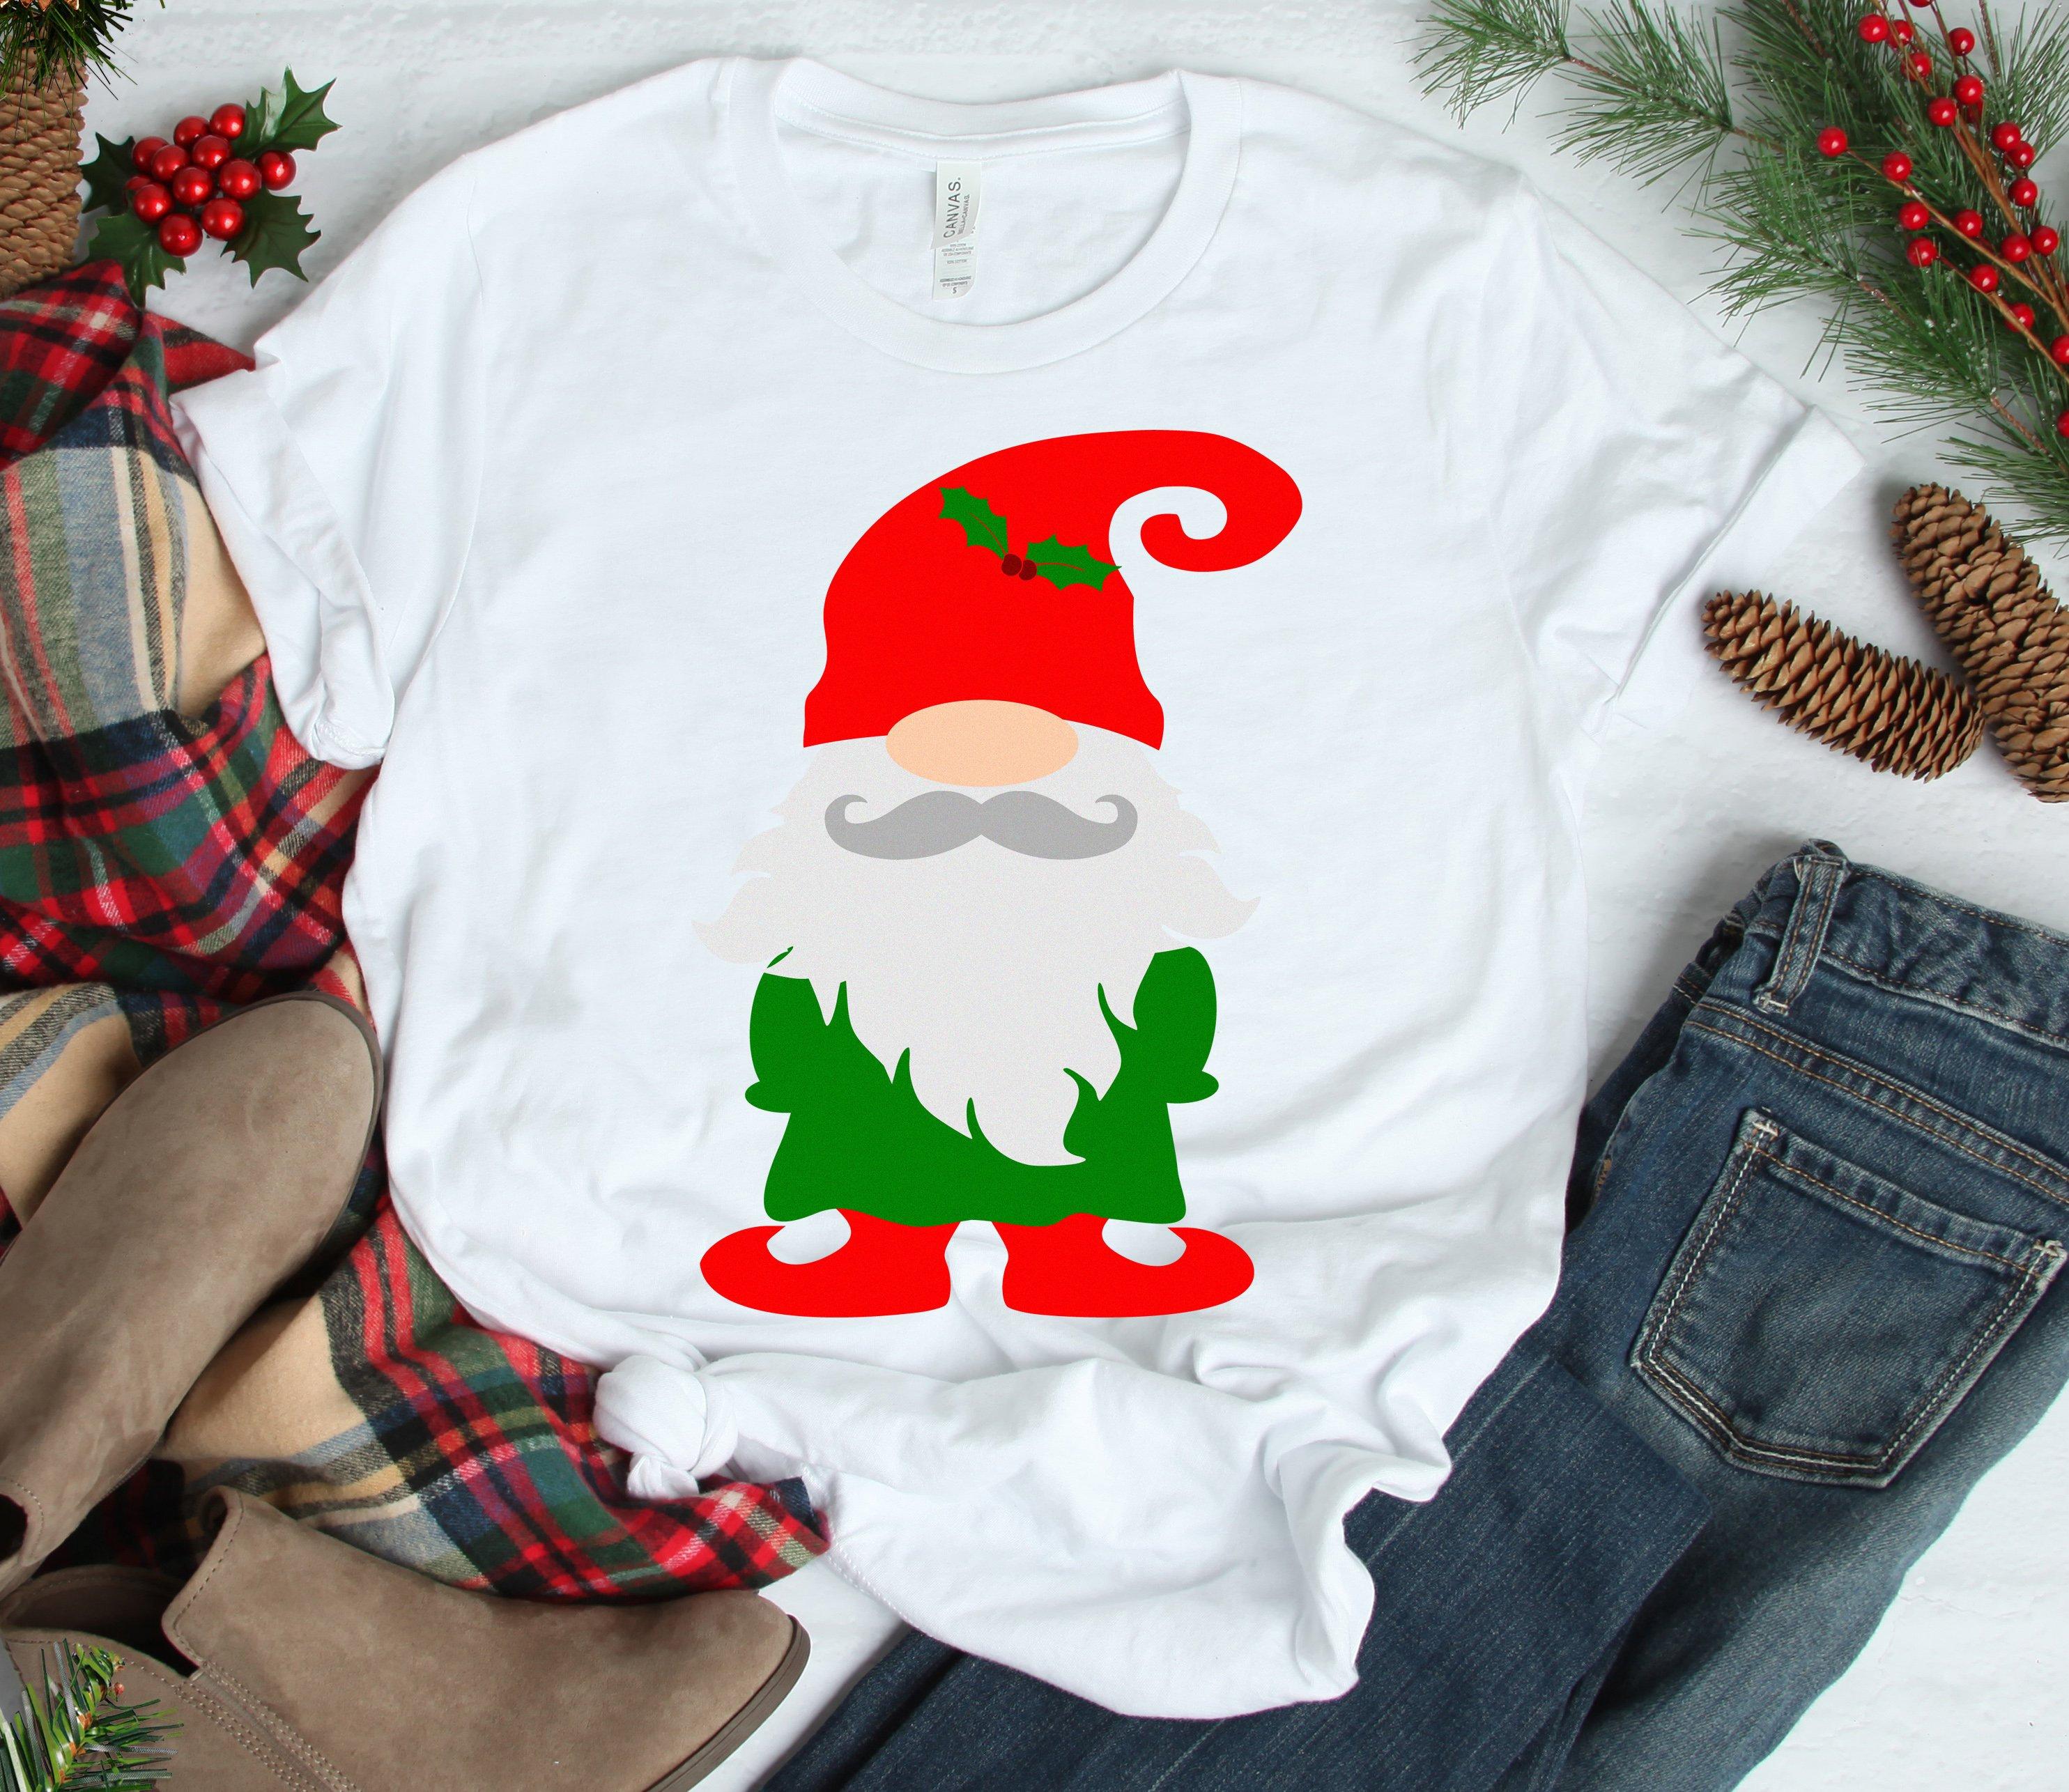 Christmas Gnomes Clipart.Christmas Gnome Svg Christmas Svg Christmas Elf Gnome